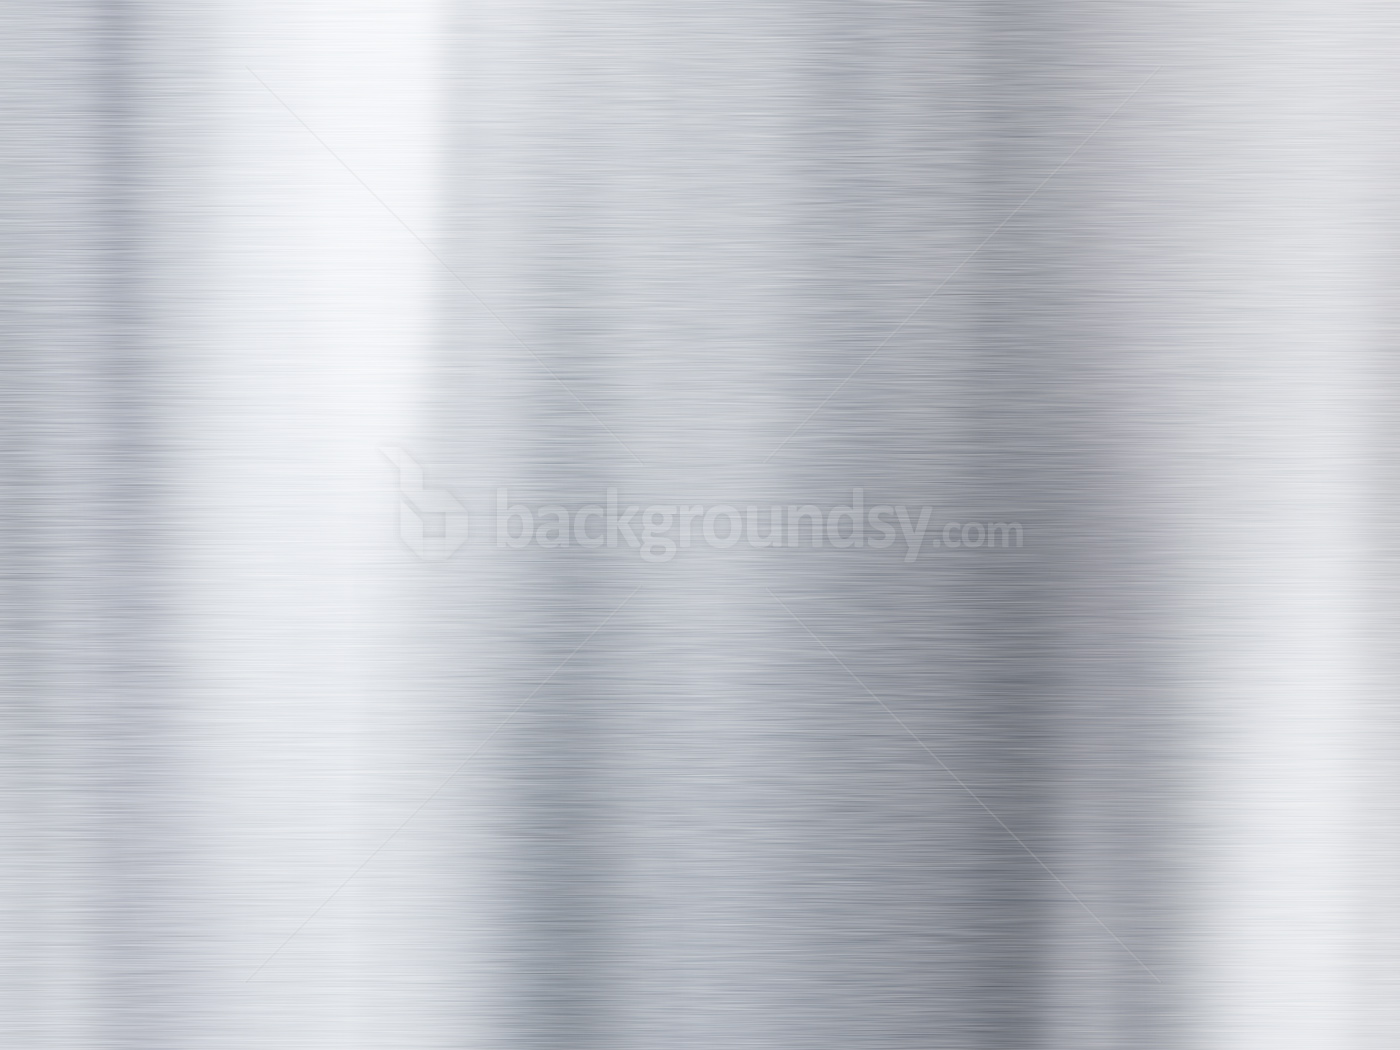 Shiny Metallic Silver ...